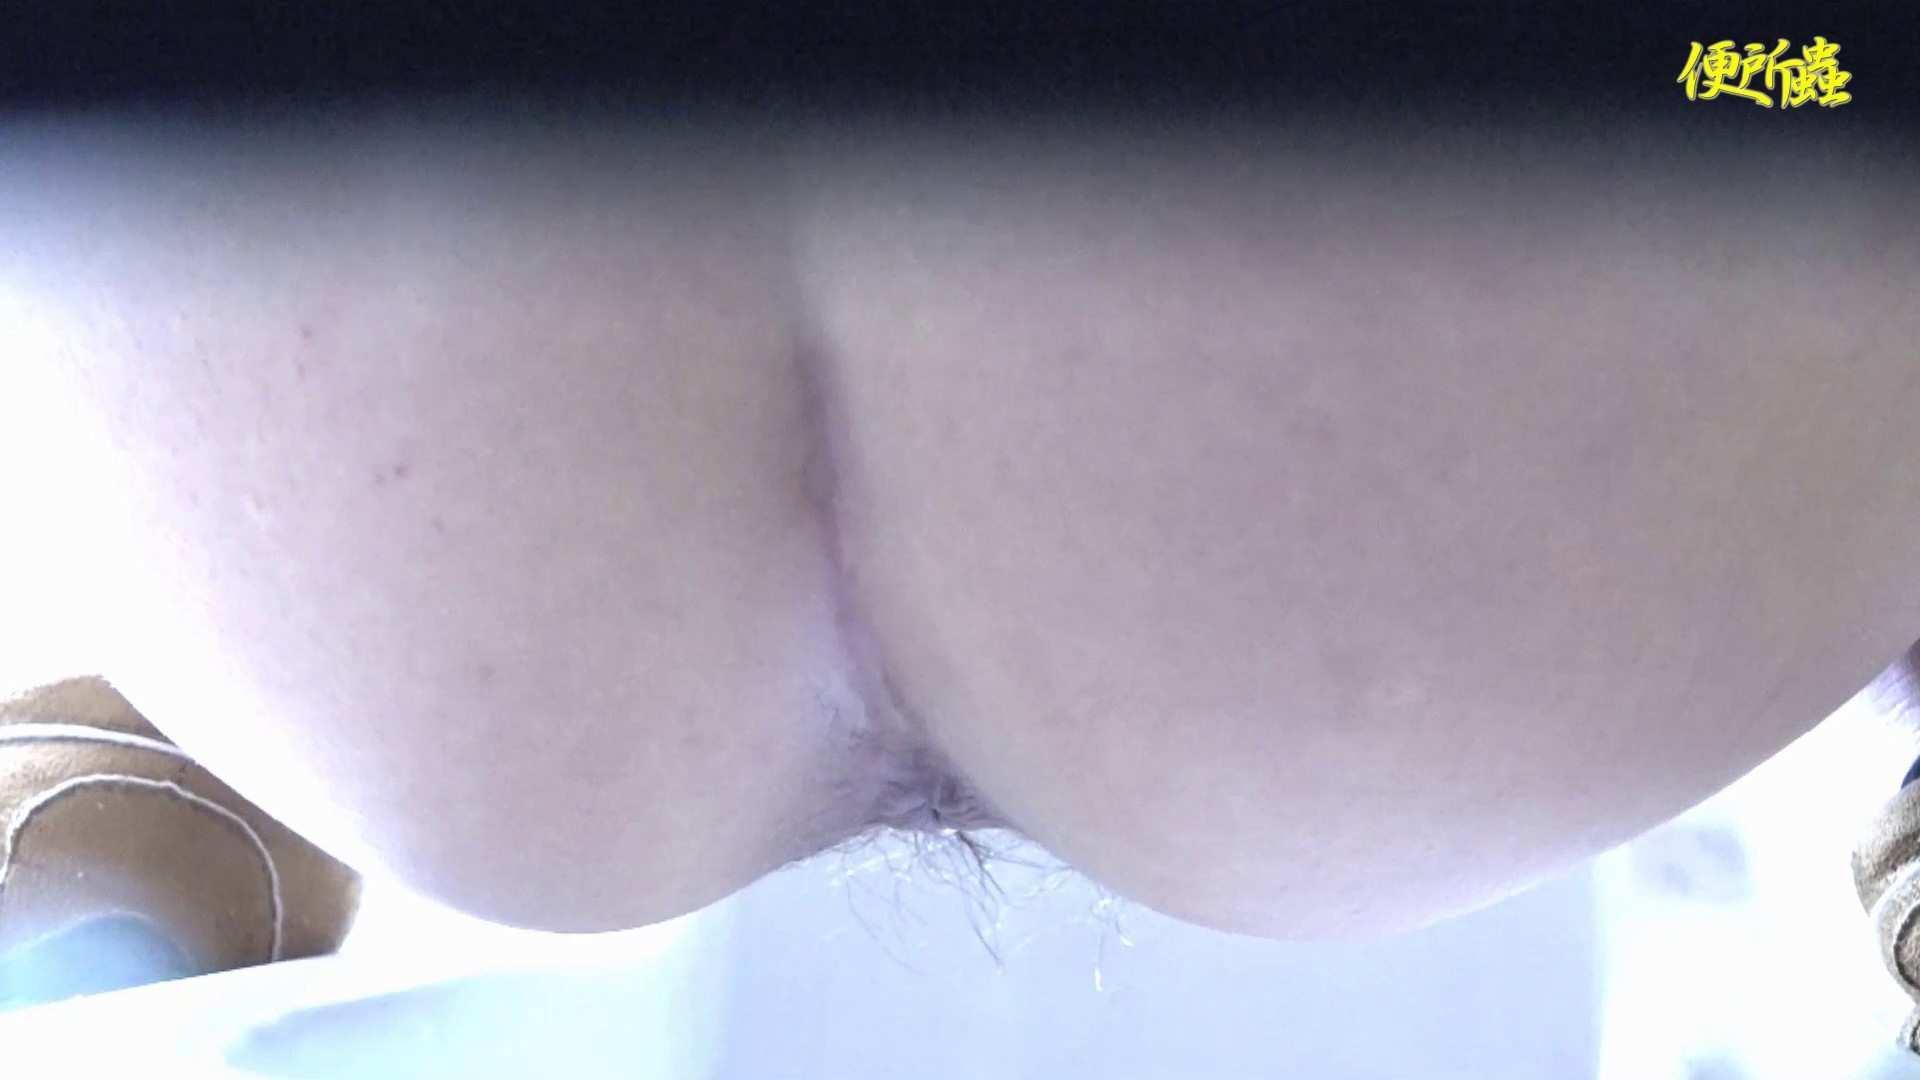 vol.01 便所蟲さんのリターン~便所蟲2匹目~ 便器 盗撮ワレメ無修正動画無料 79pic 41